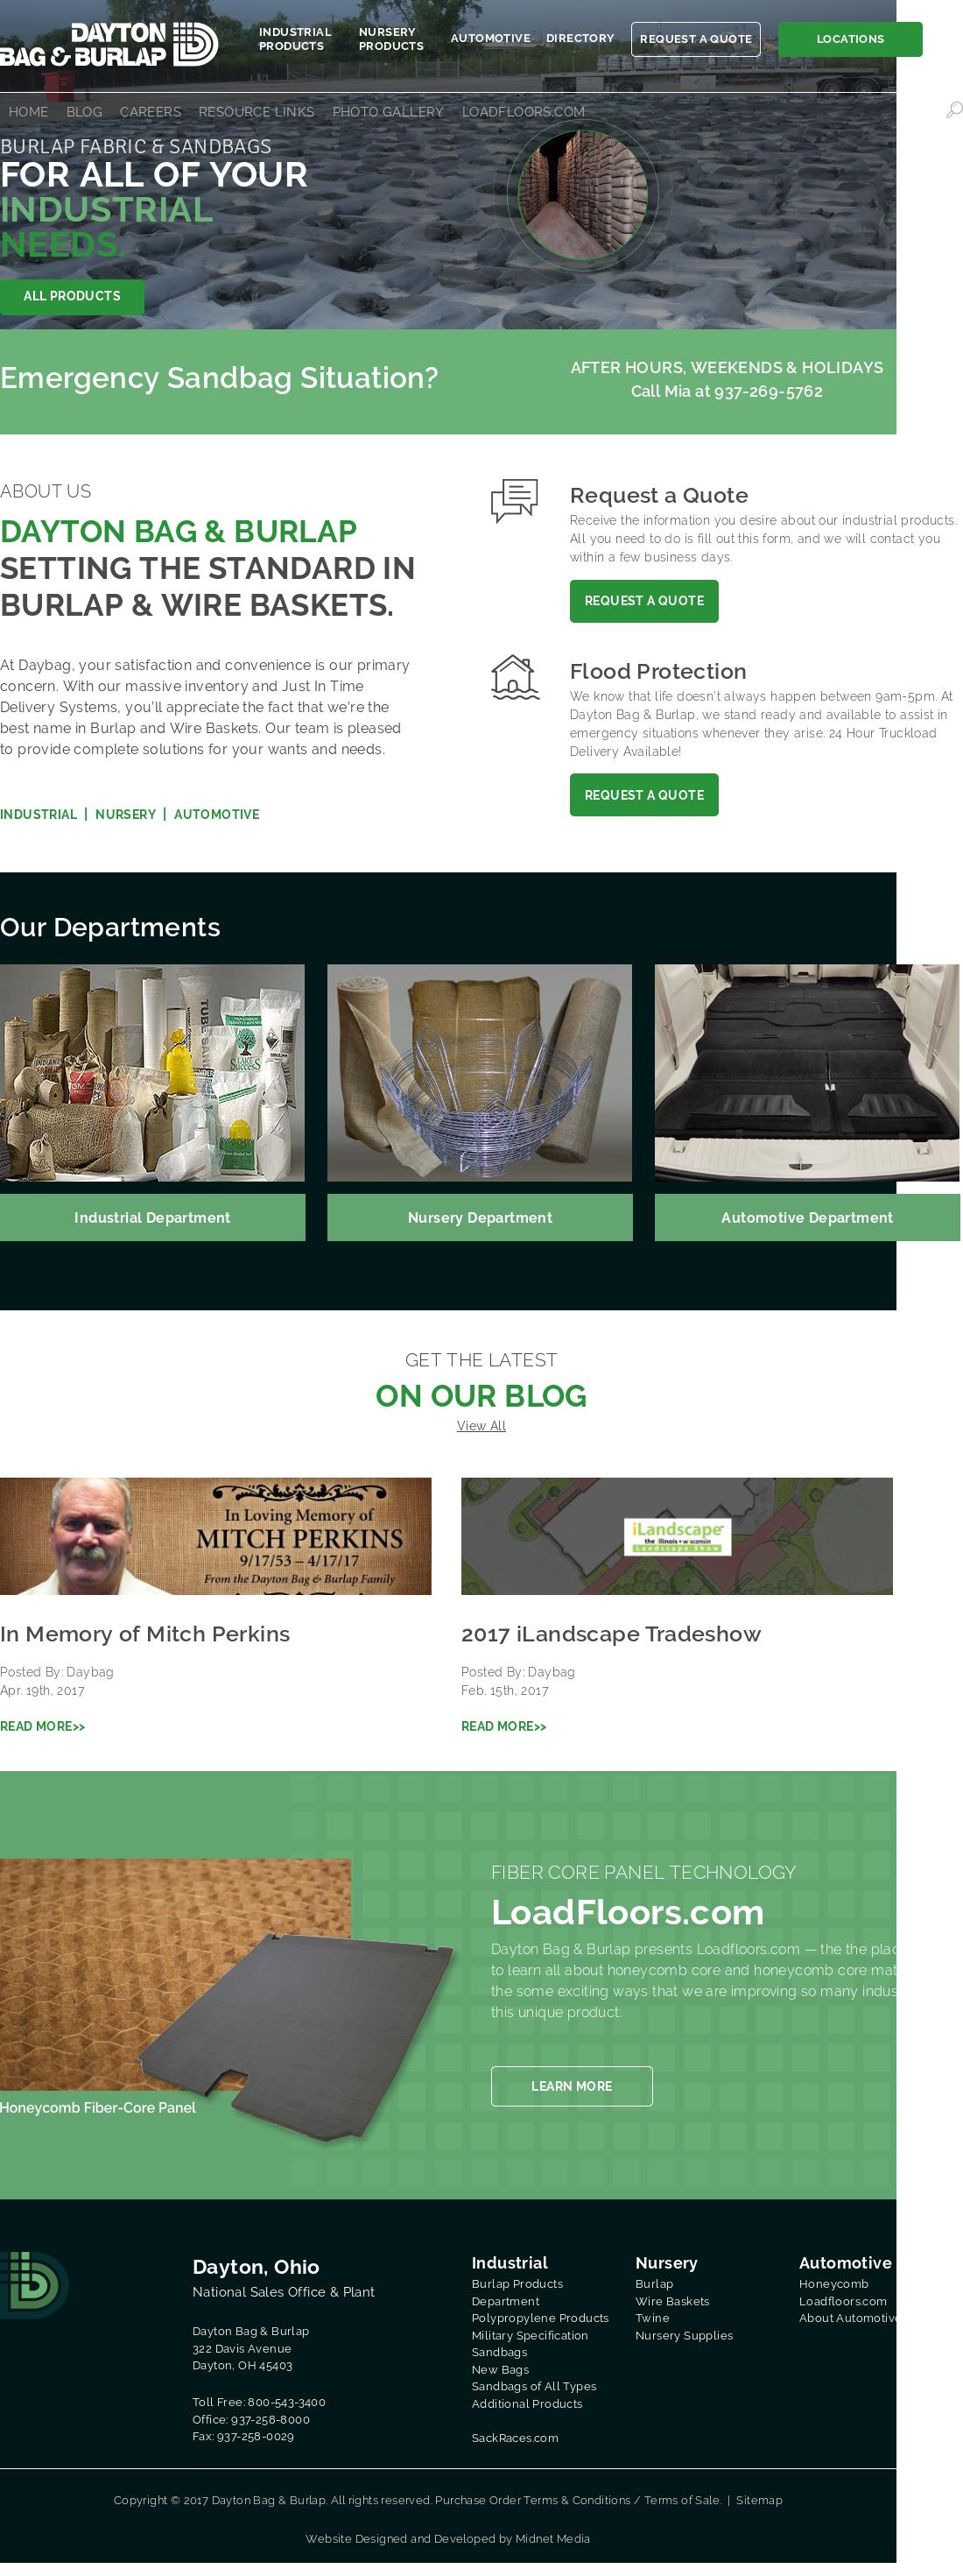 Owler Reports Dayton Bag Burlap